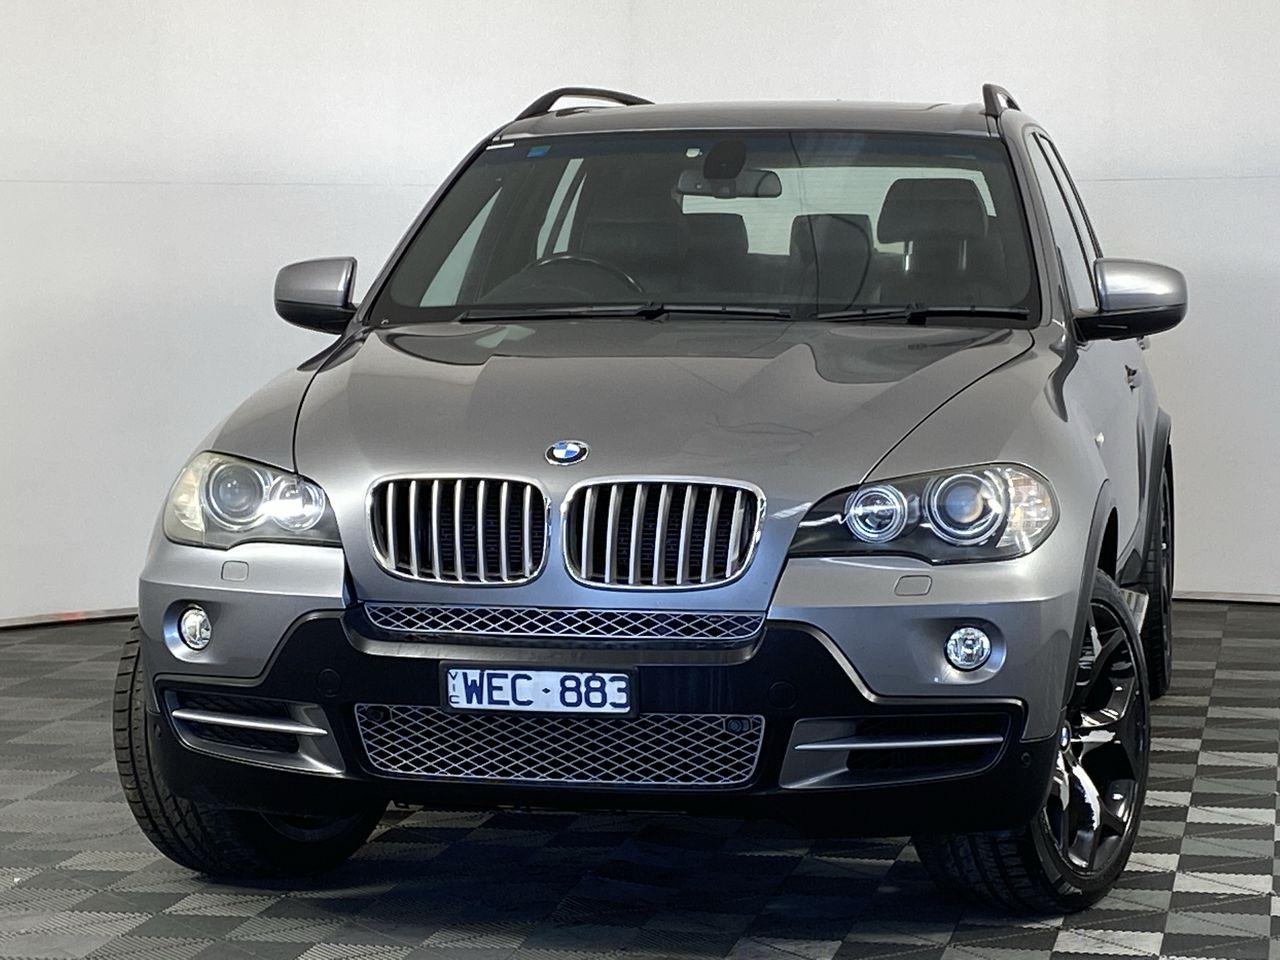 2008 BMW X5 4.8i E70 Automatic Wagon